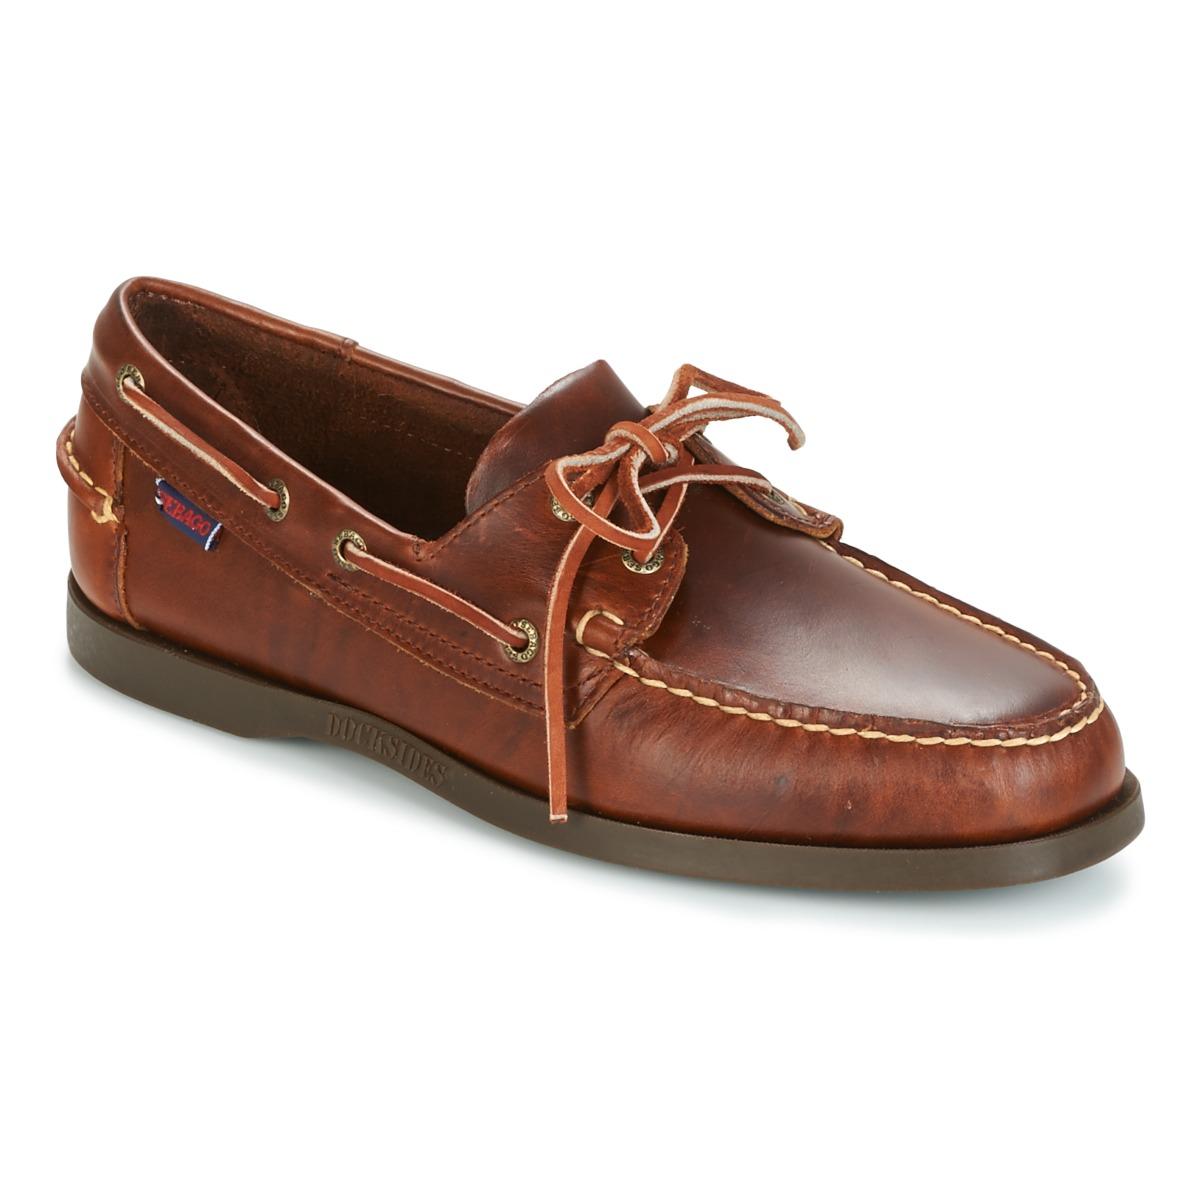 f7bea3ebf17b39 Sebago DOCKSIDES Marron - Chaussures Chaussures bateau Homme 95,04 €